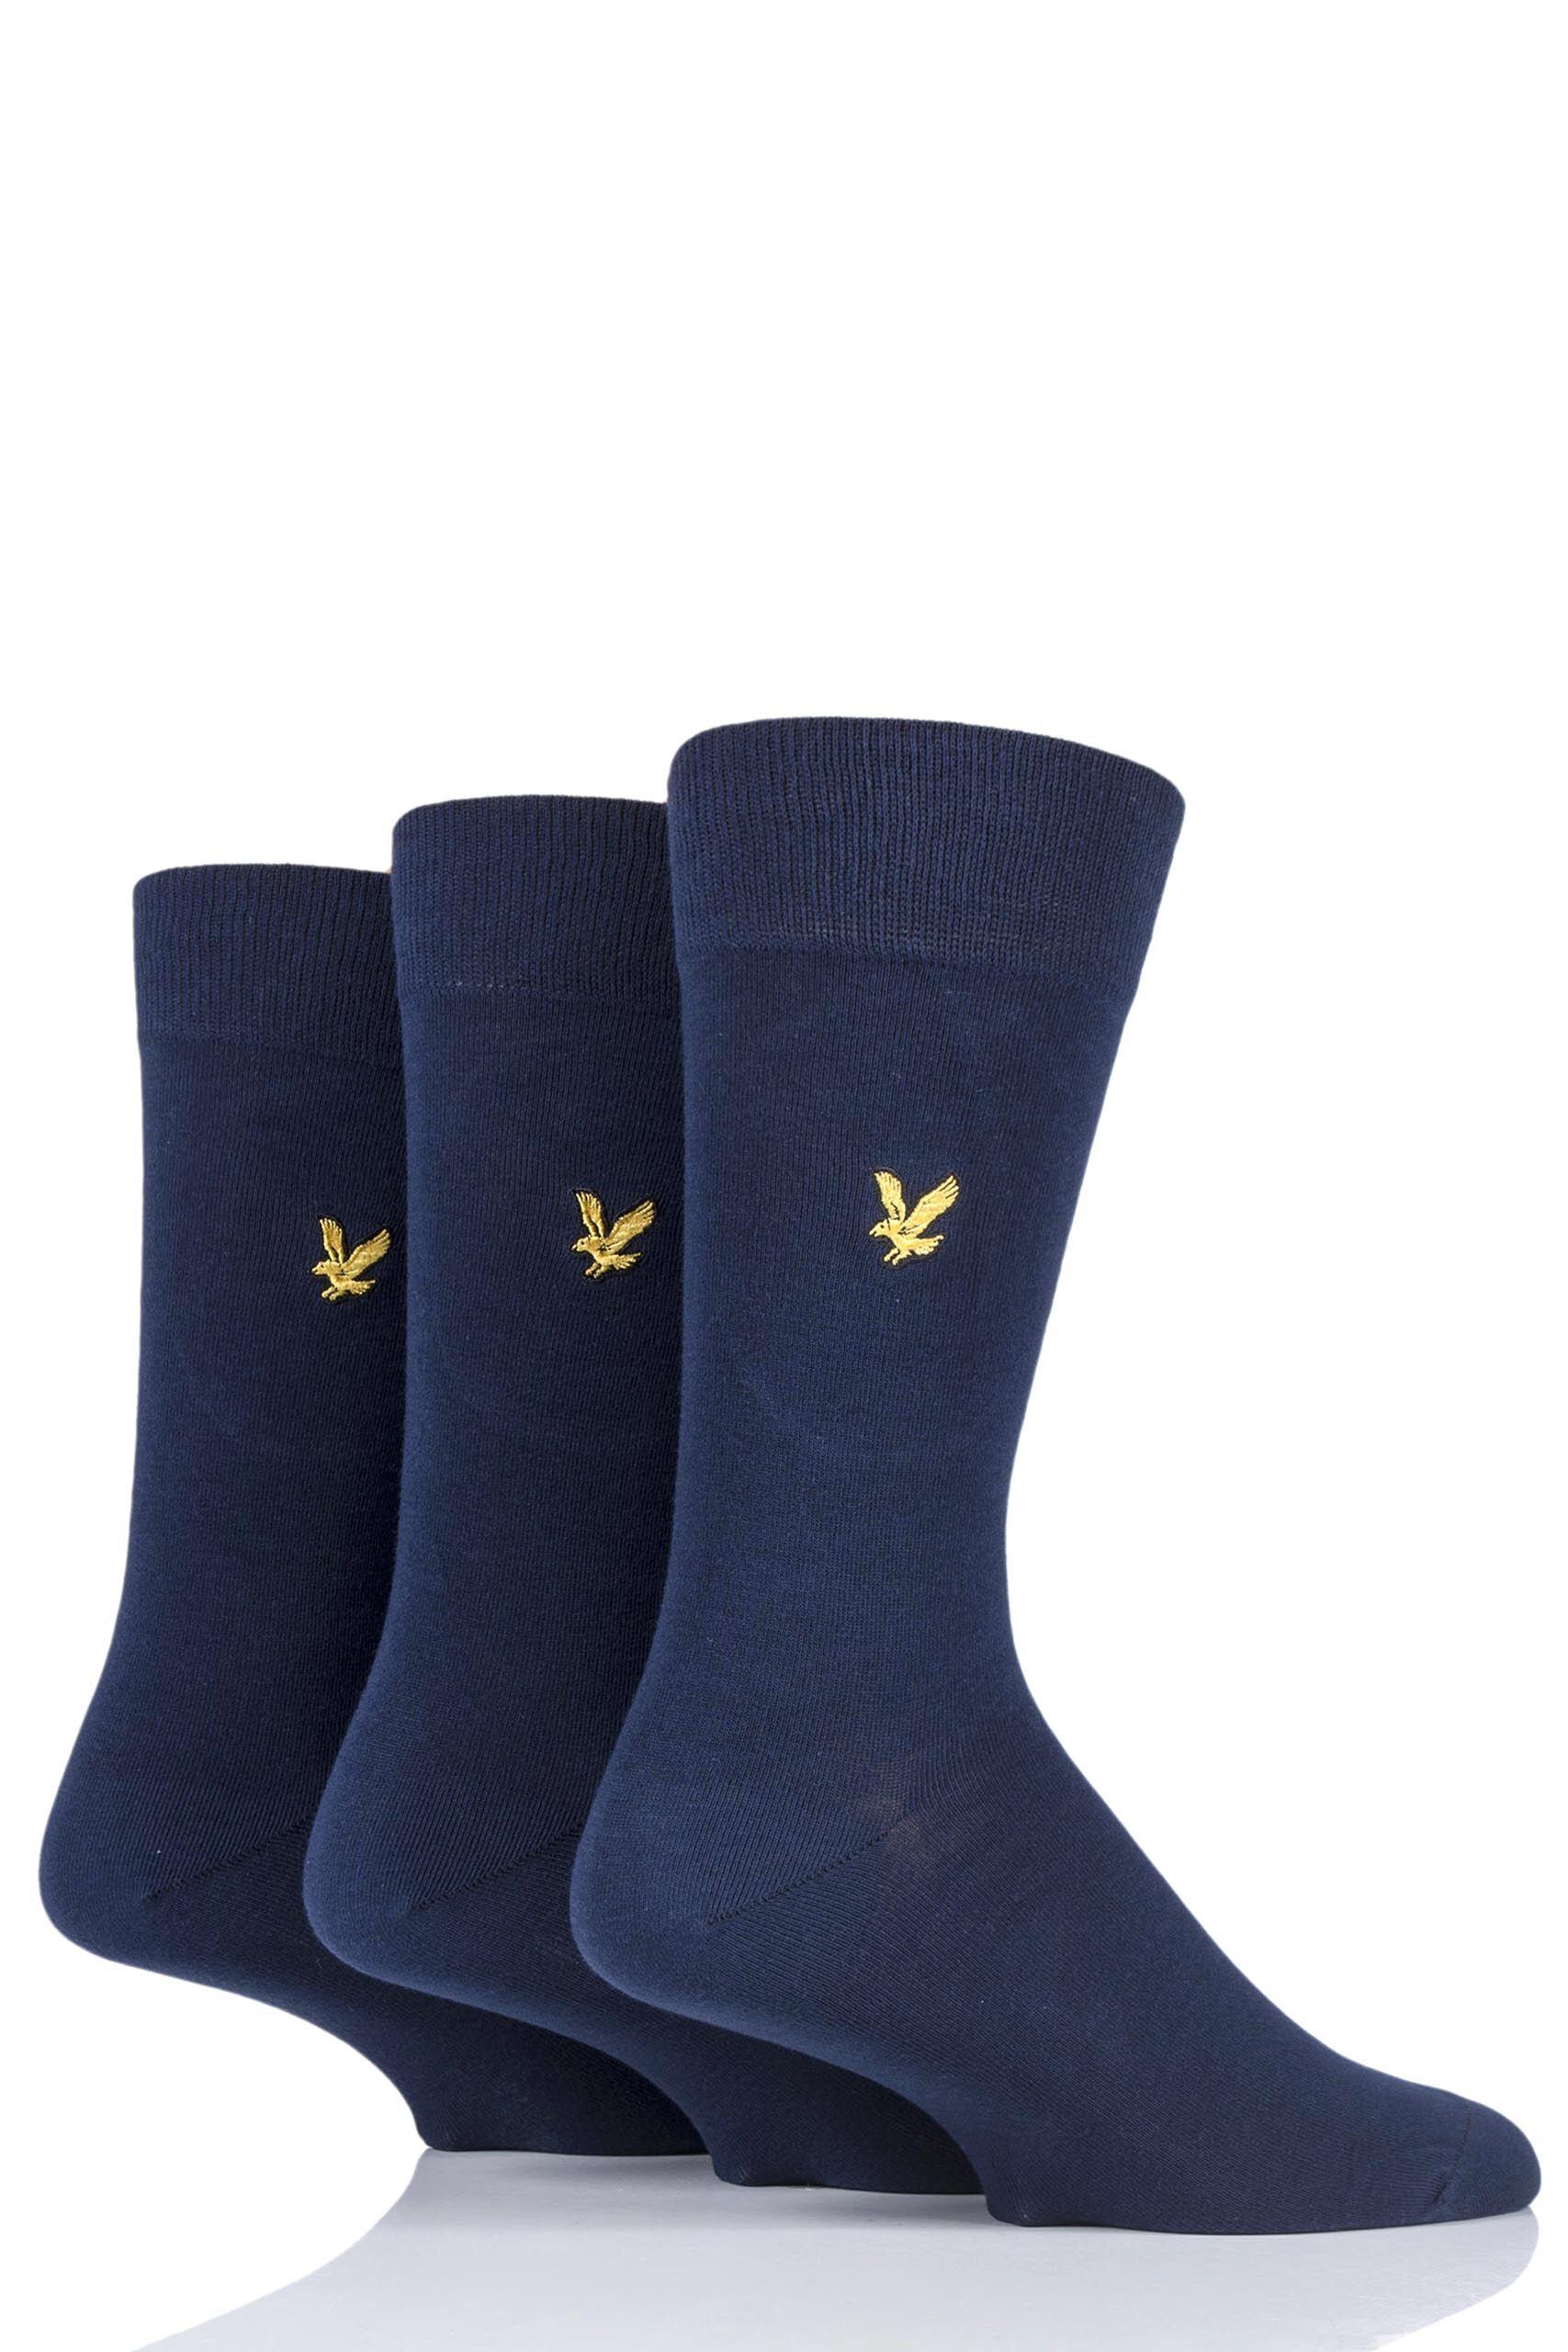 Image of 3 Pair Peacoat Angus Eagle Embroidery Cotton Socks Men's 7-11 Mens - Lyle & Scott